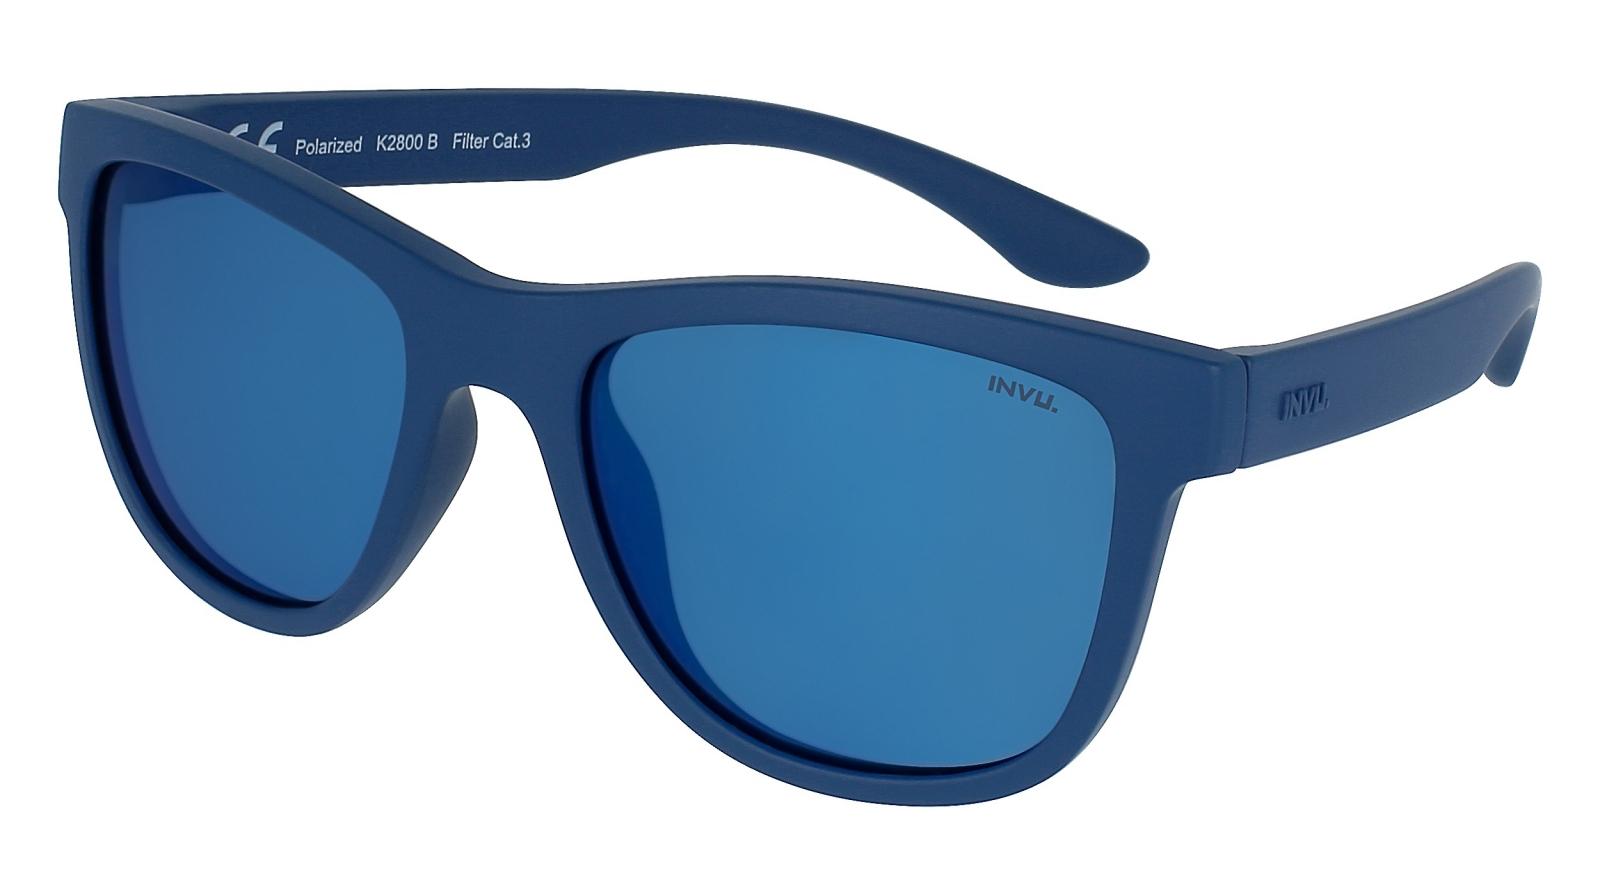 INVU. Kids K2800B - Slnečné okuliare pre deti 4-7 r.